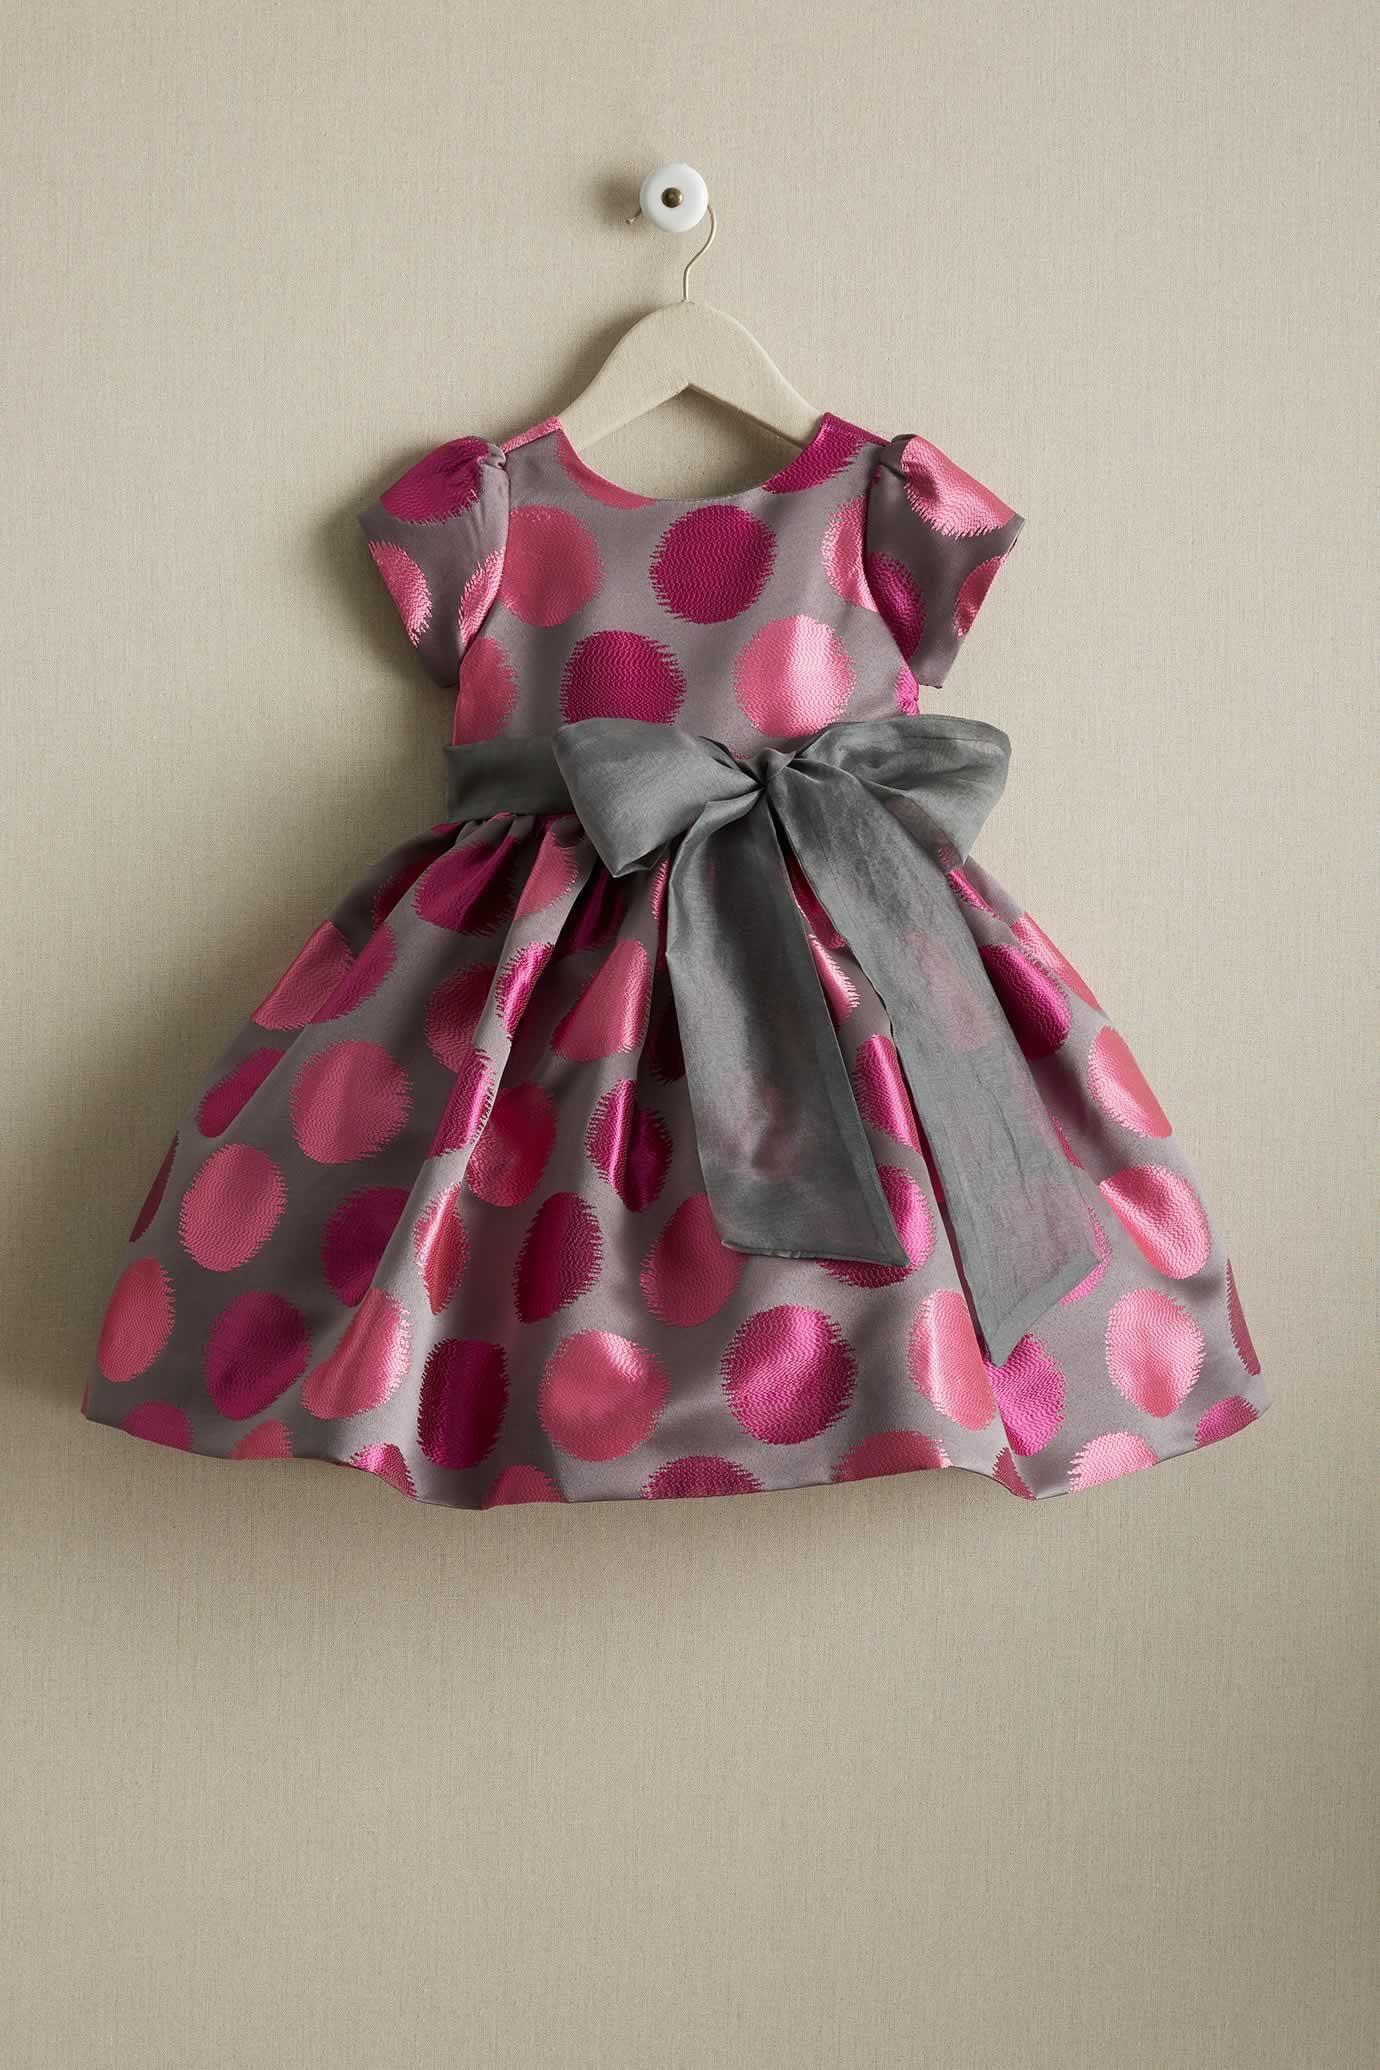 Girls Pink Polka Dot Dress  Baby girl dress patterns, Baby frocks